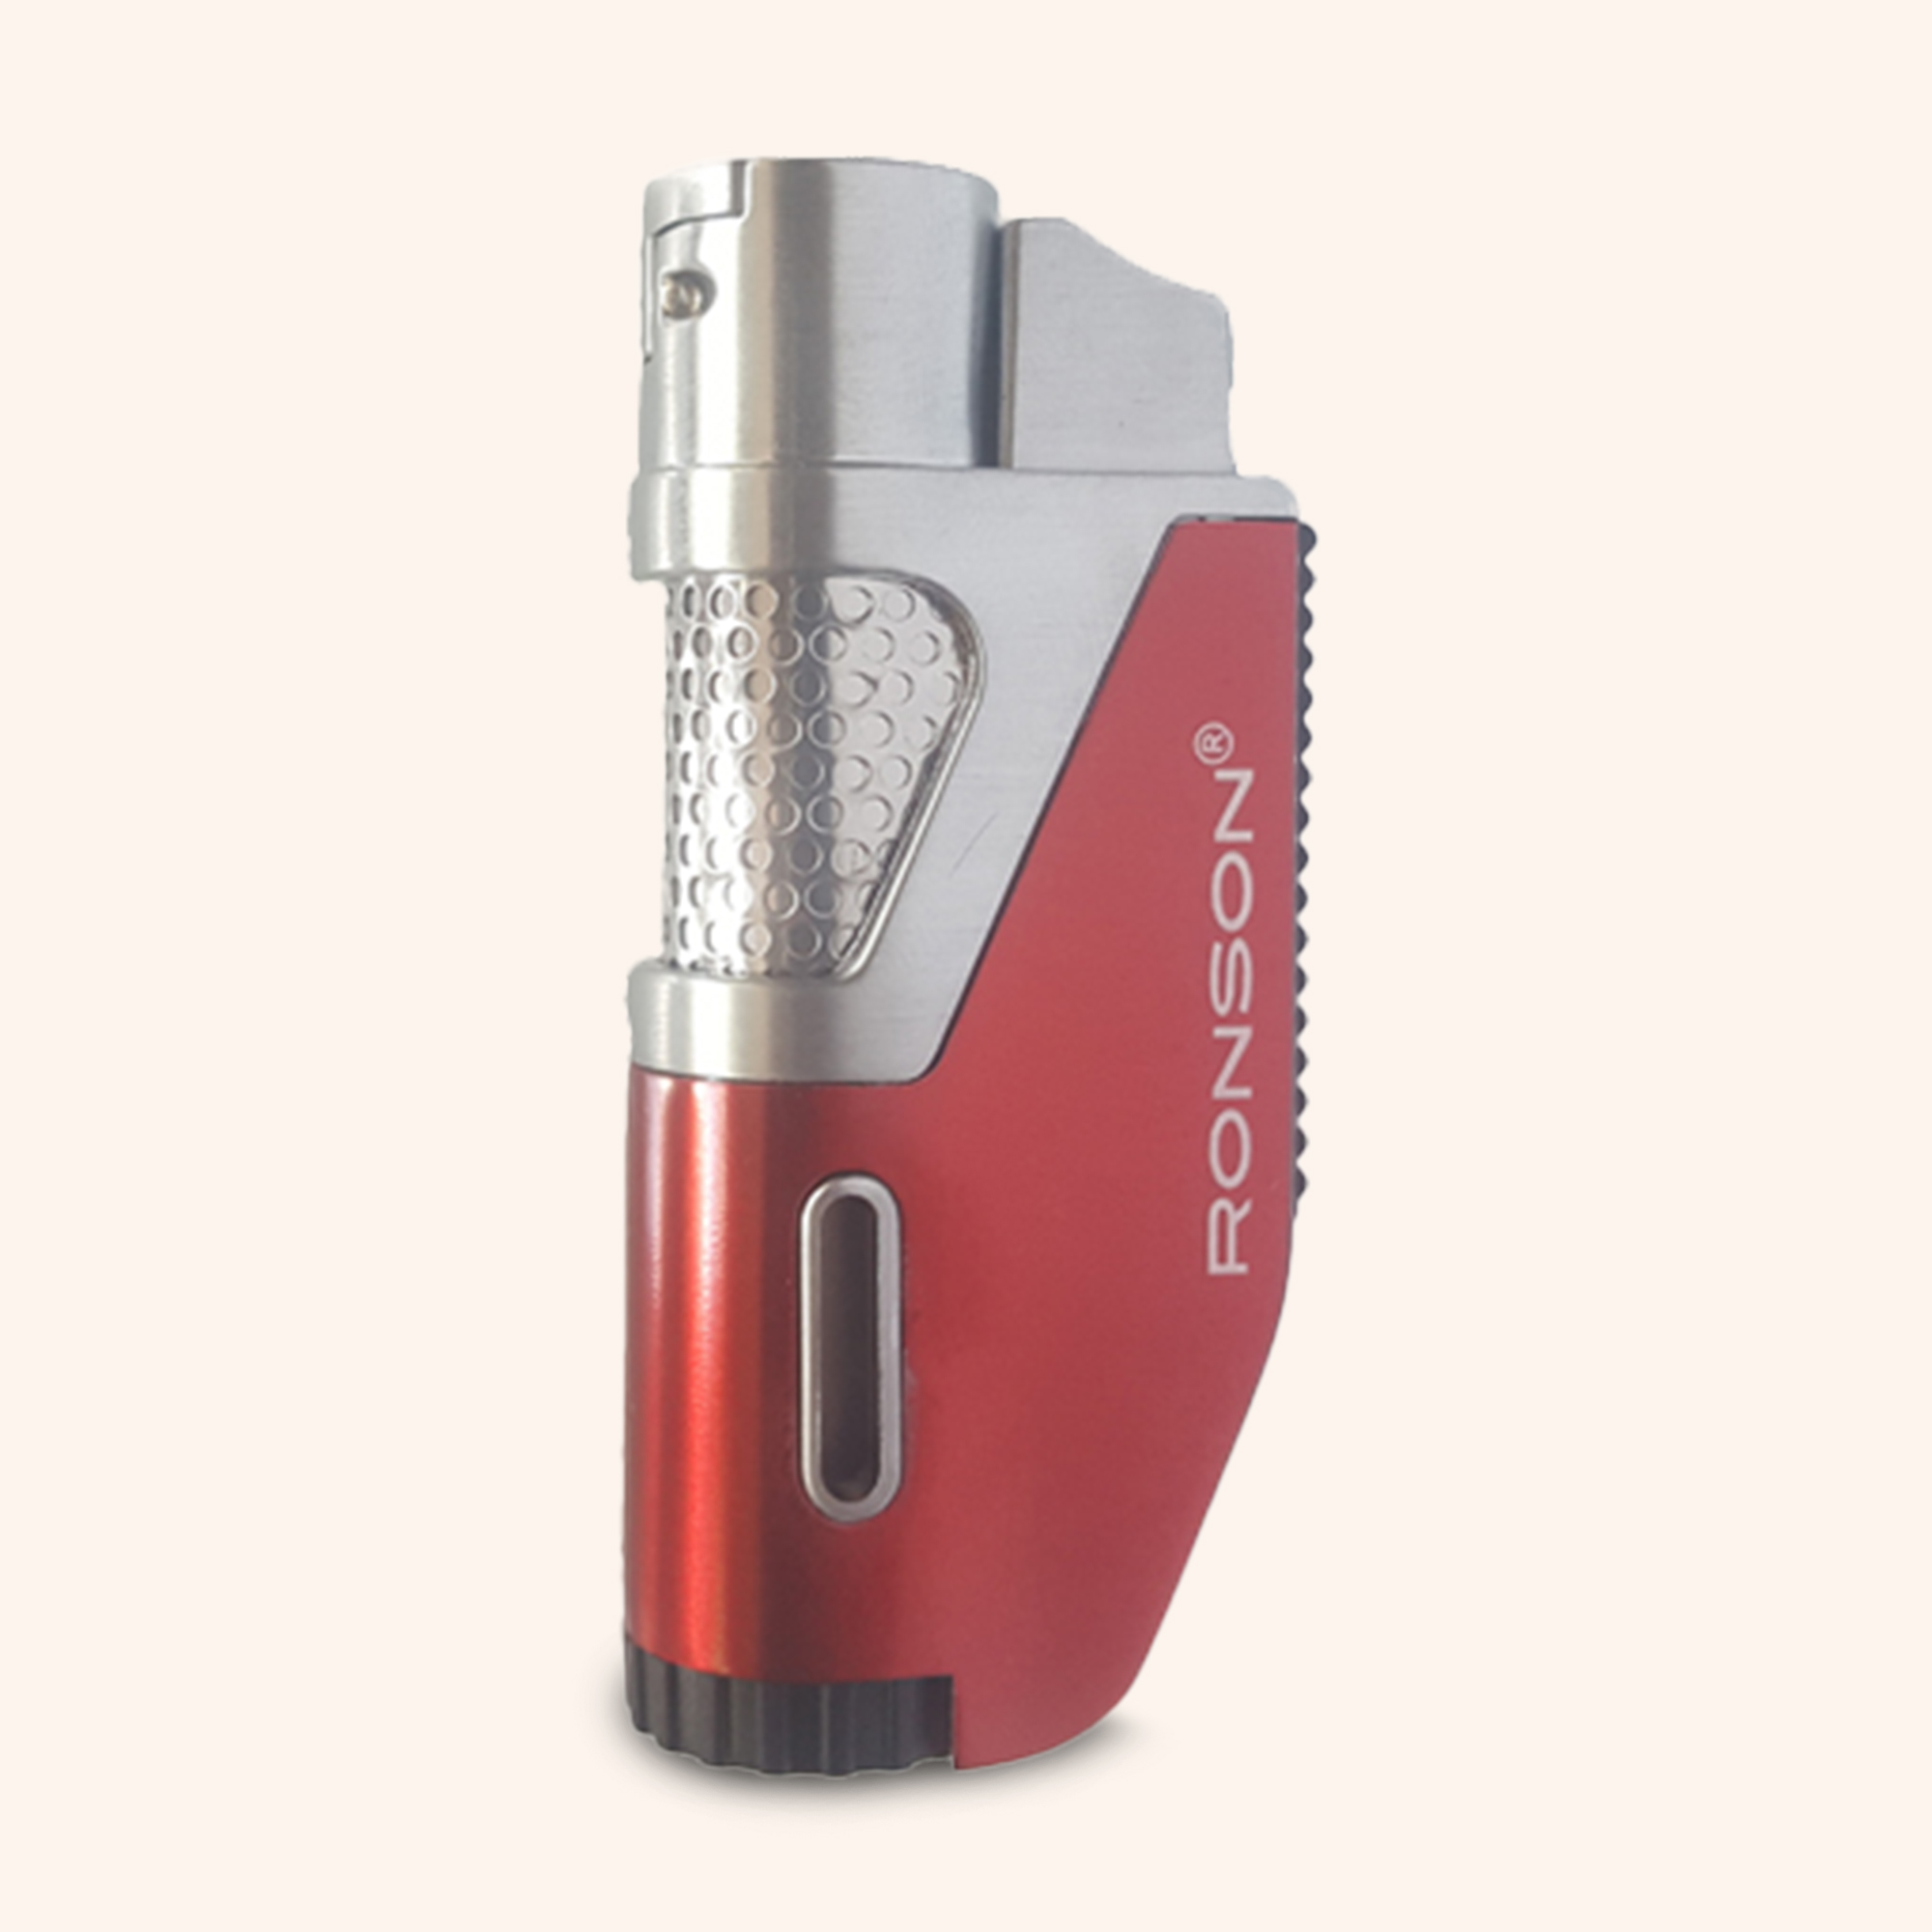 Ronson Windproof Lighter RR